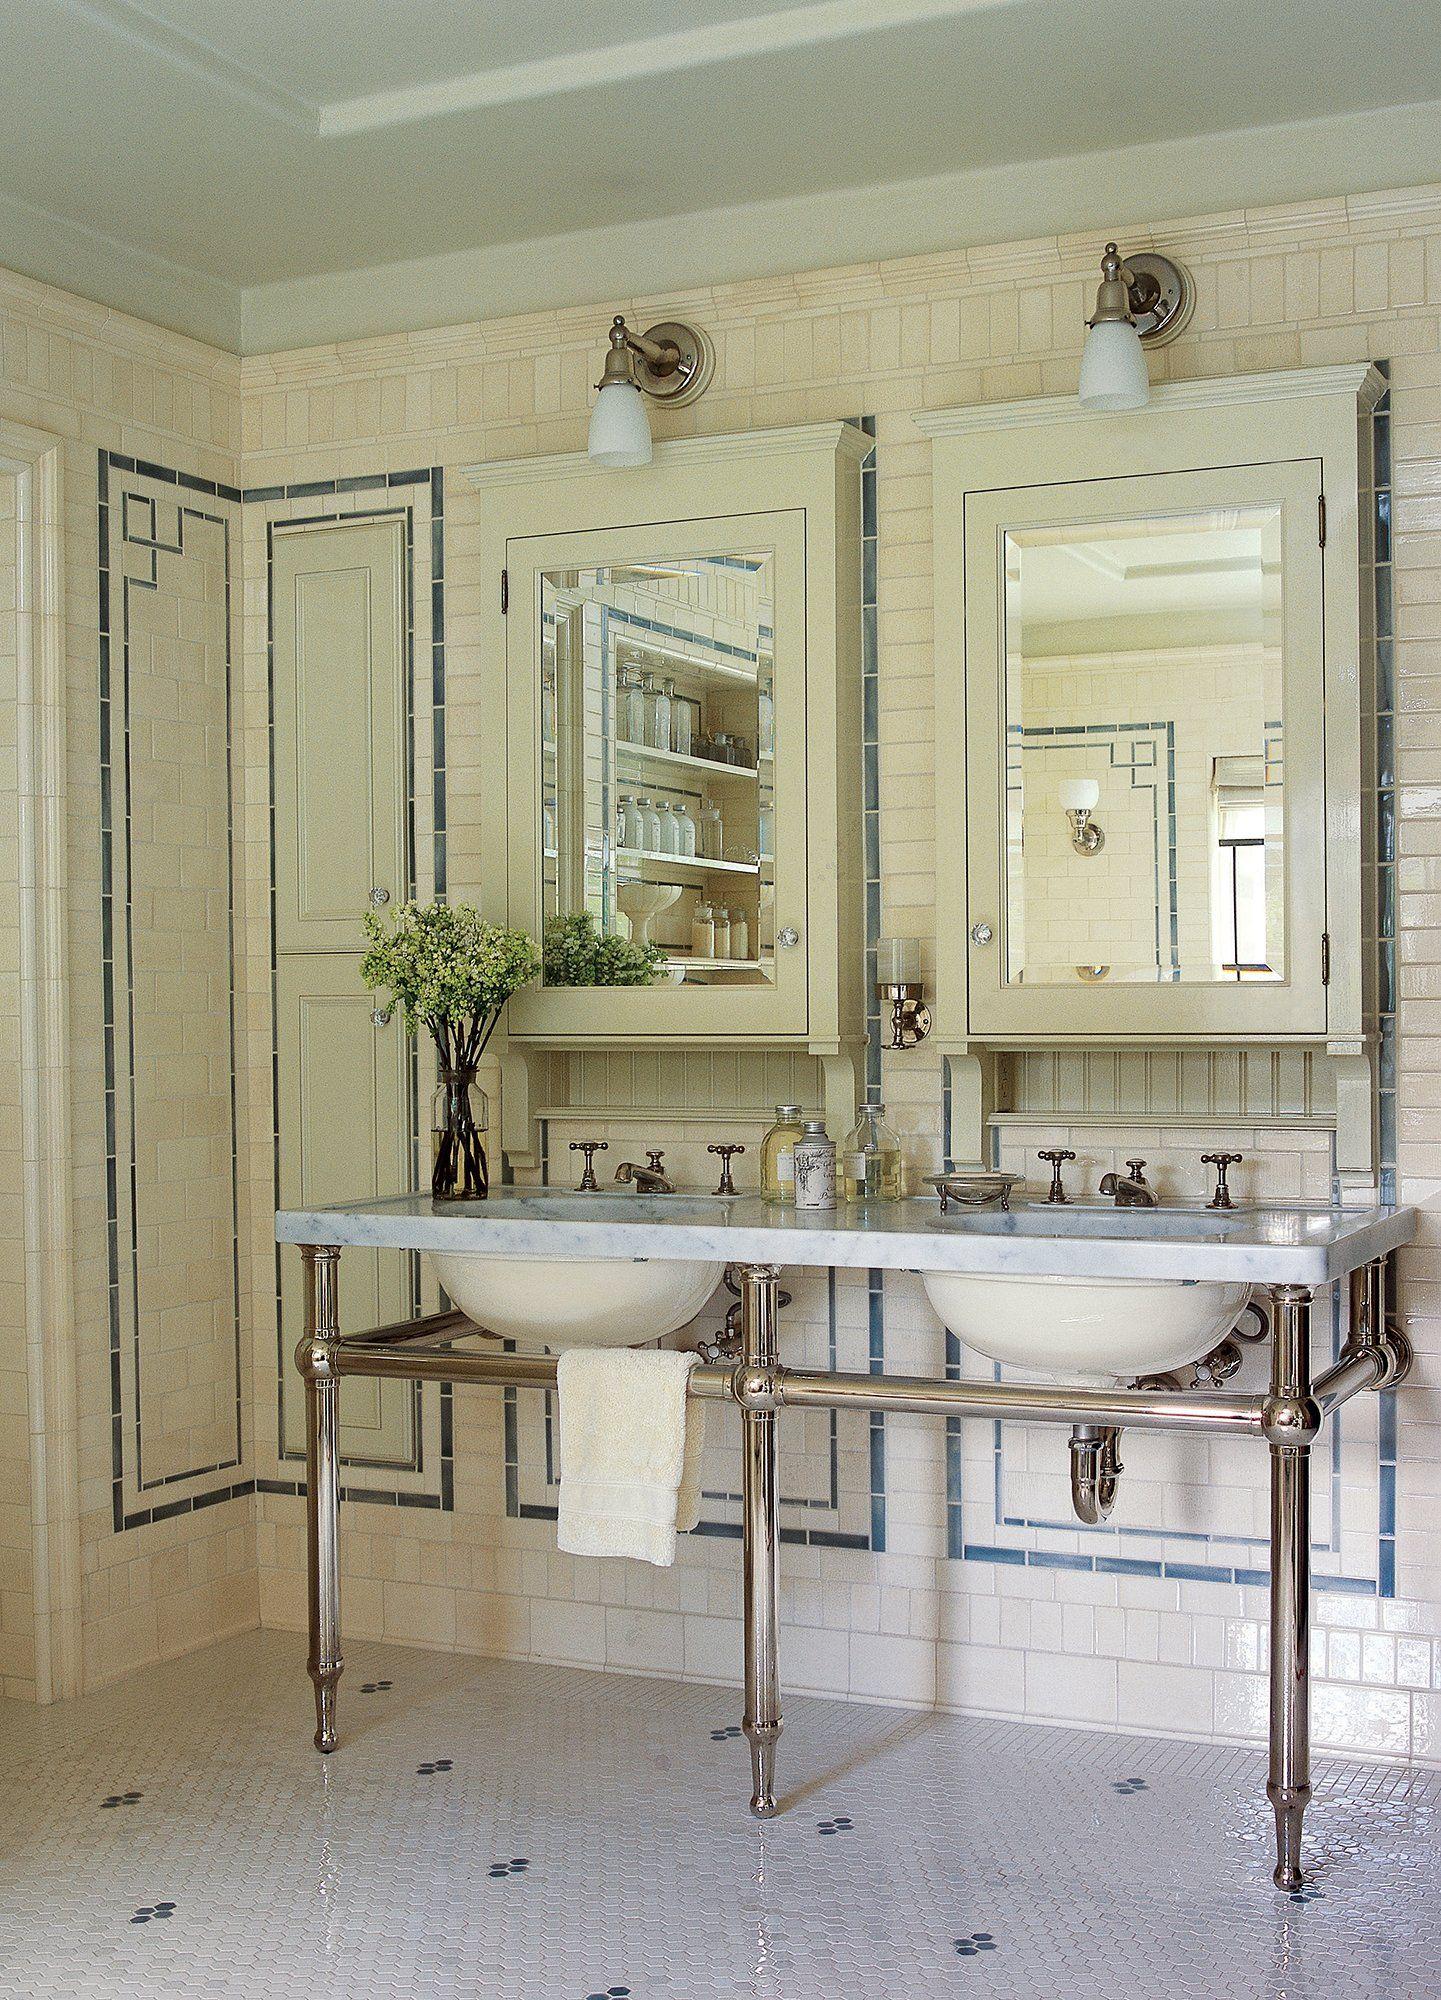 Zoolander Set Designers Take Us Inside Hansel S House Roman And Williams Tile Trim Retro Tiles